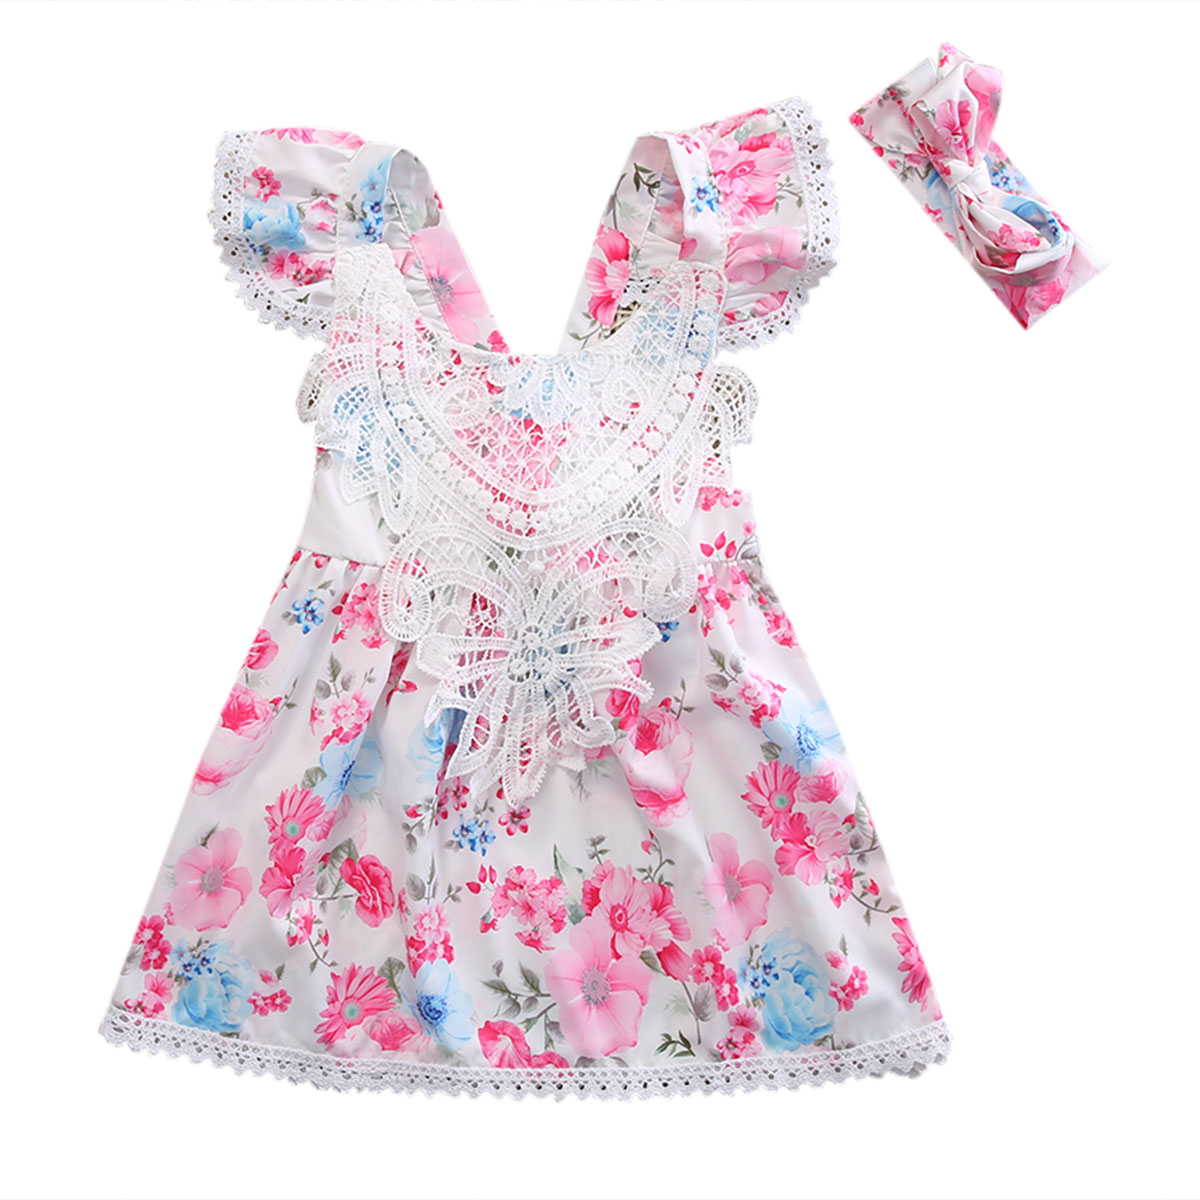 87beb9571 New Arrival Newborn Toddler Kids Baby Girl Flower Floral Dress ...